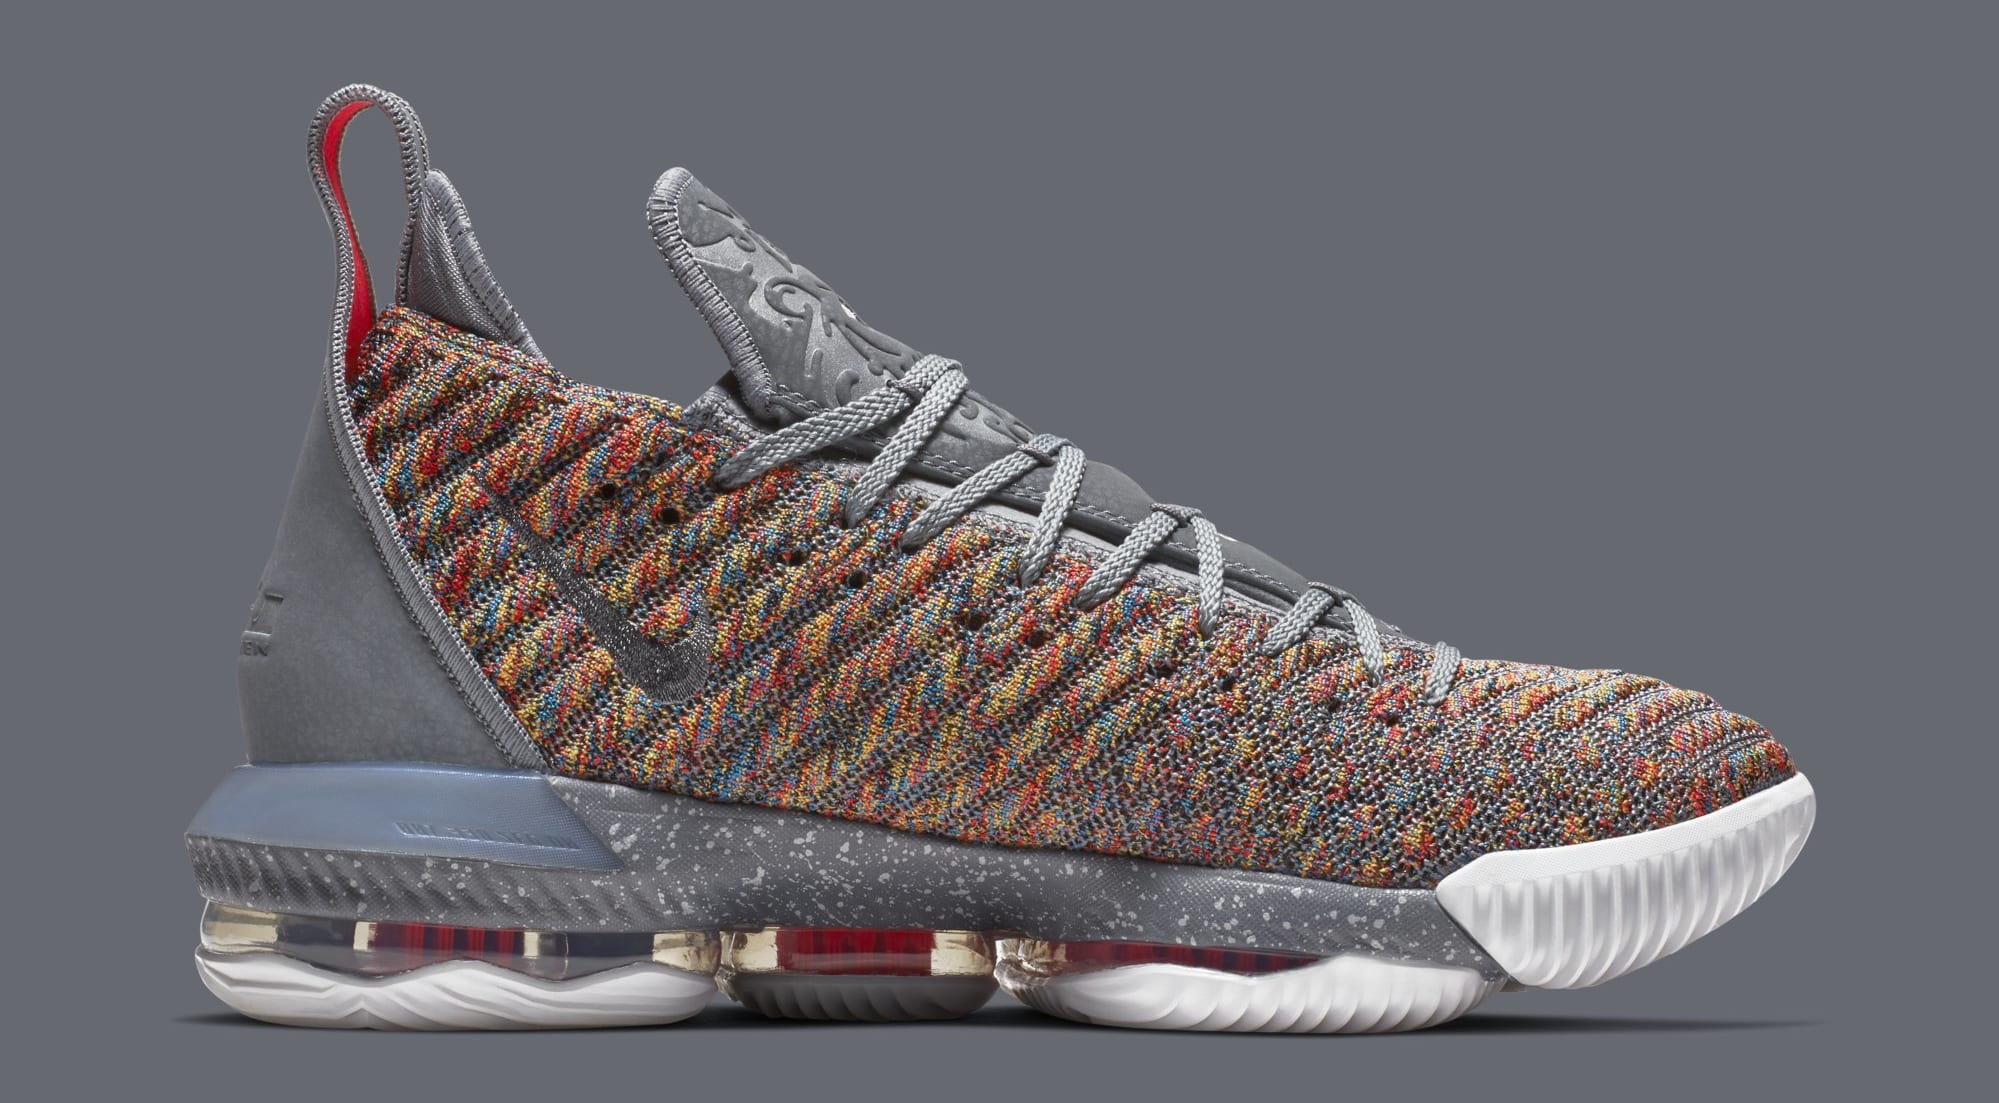 Nike LeBron 16 'Multicolor' BQ5969-900 (Medial)